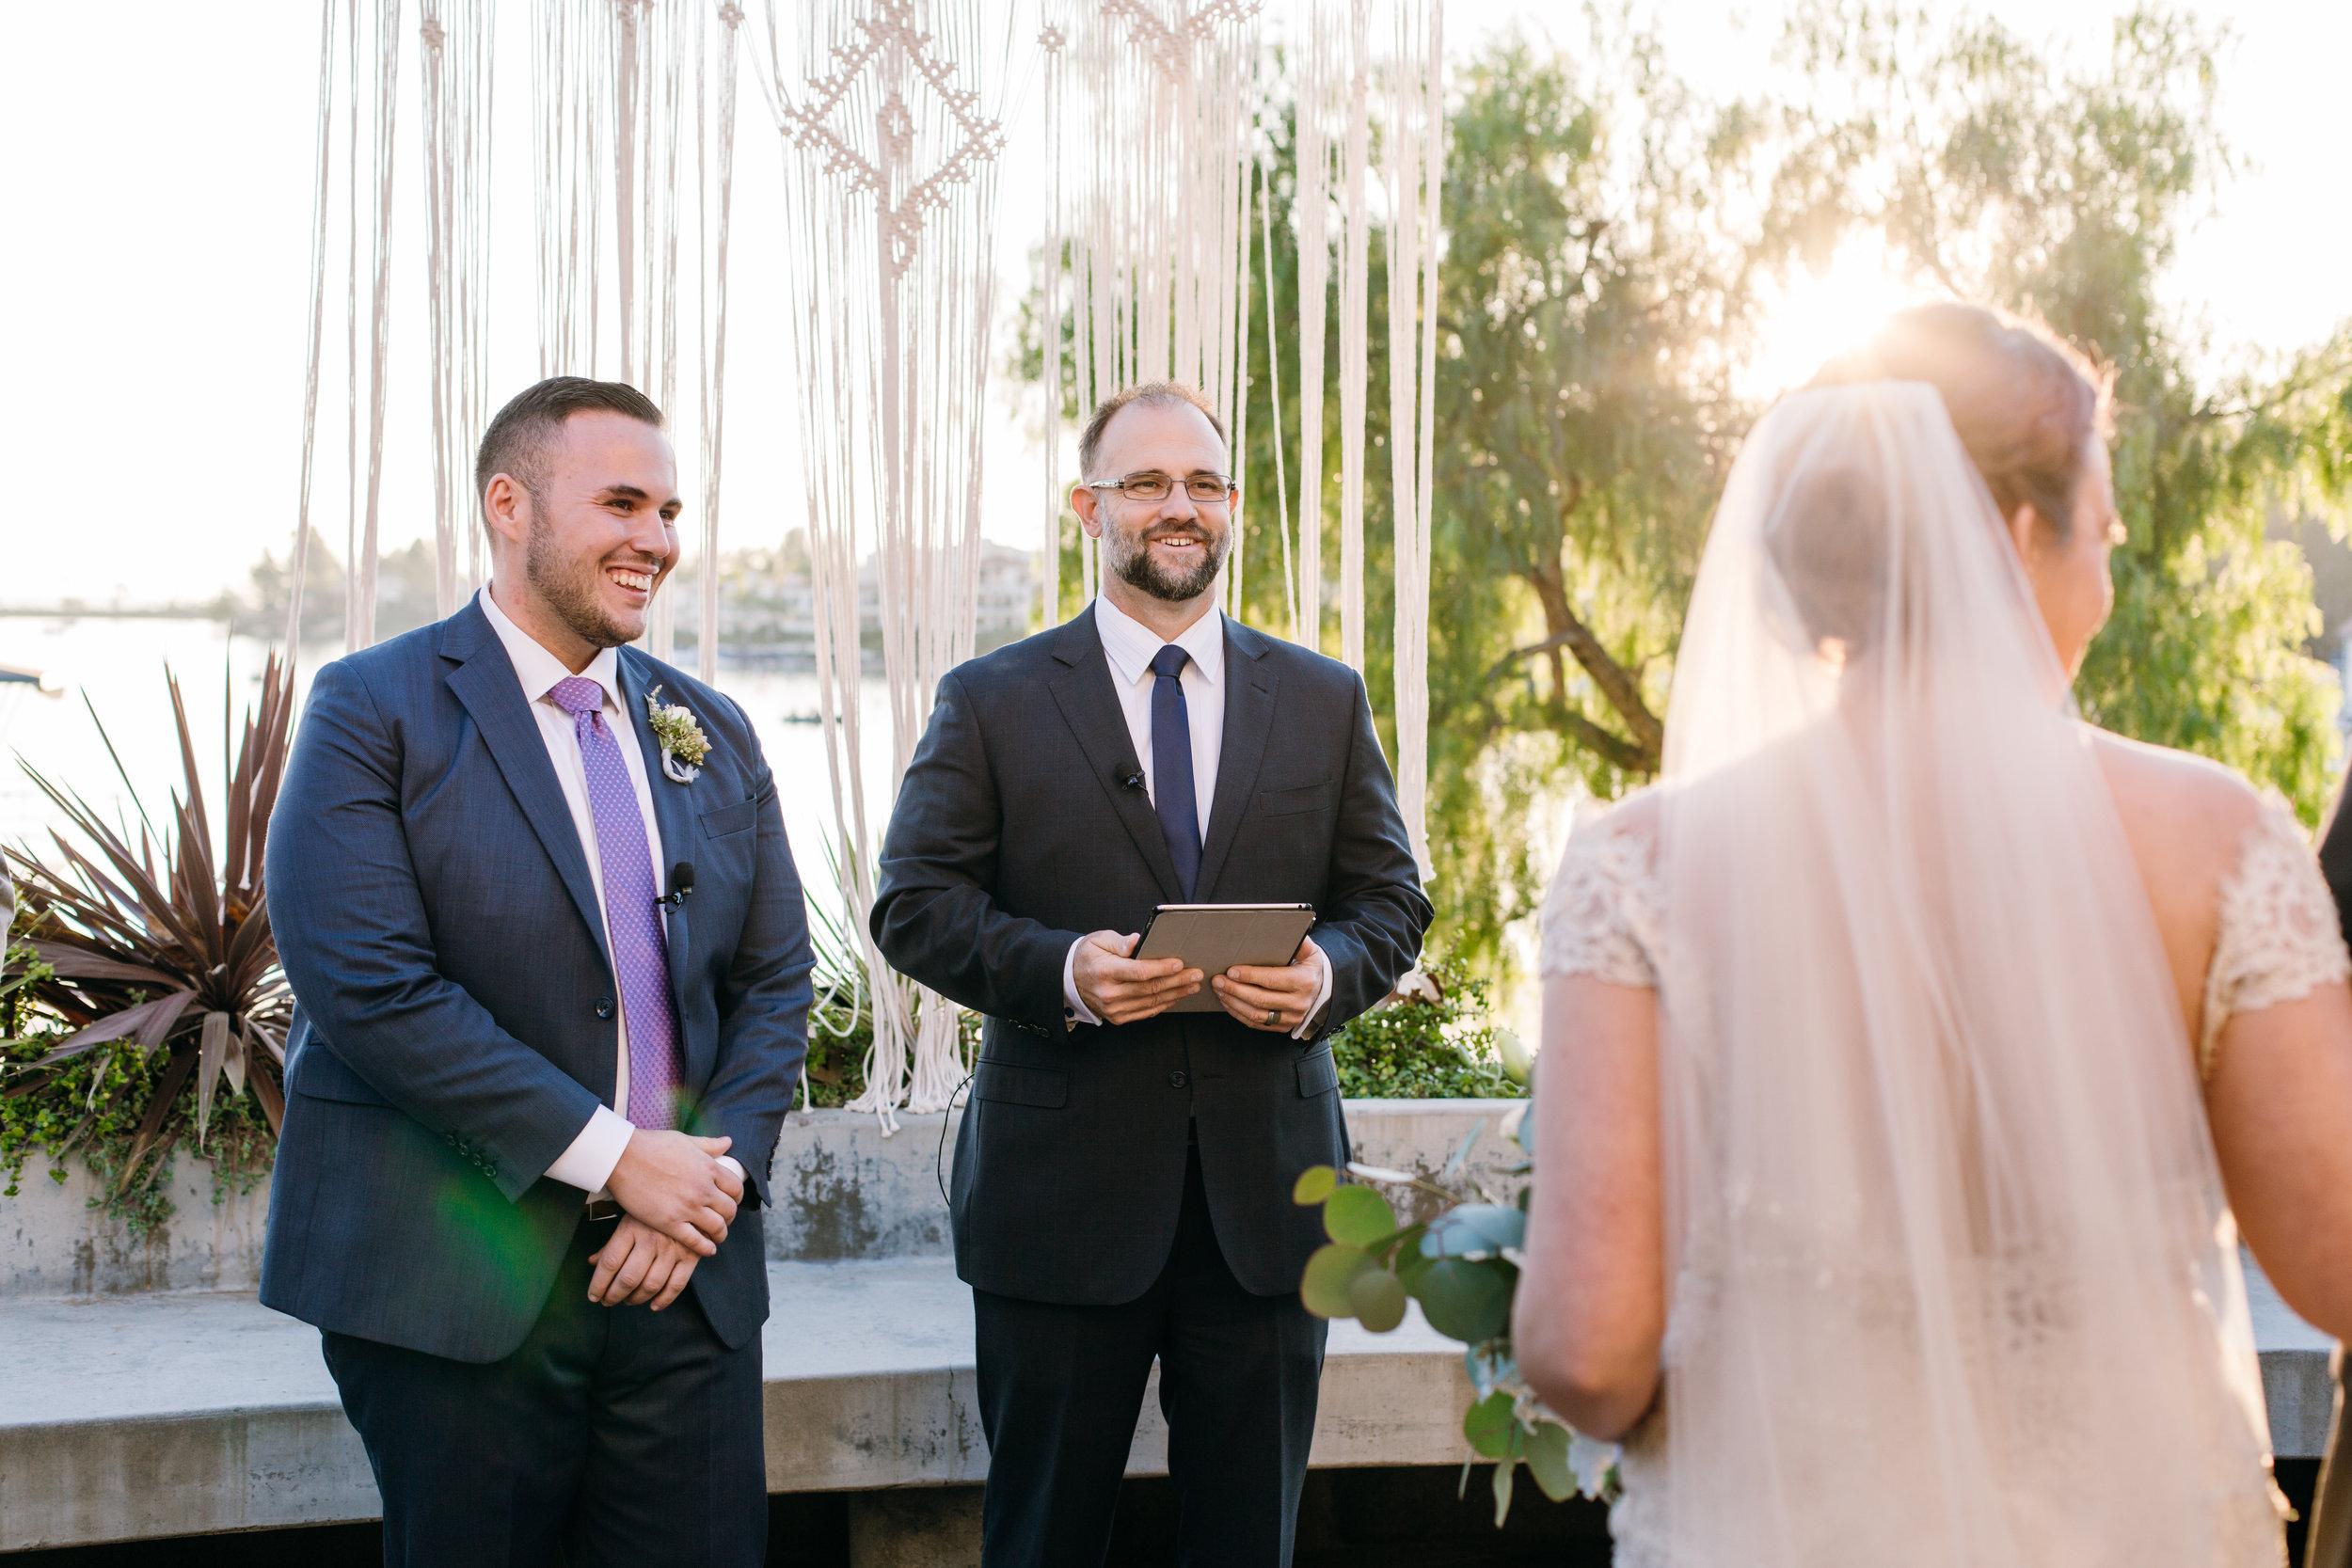 KaraNixonWeddings-DanaPoint-Wedding-24.jpg